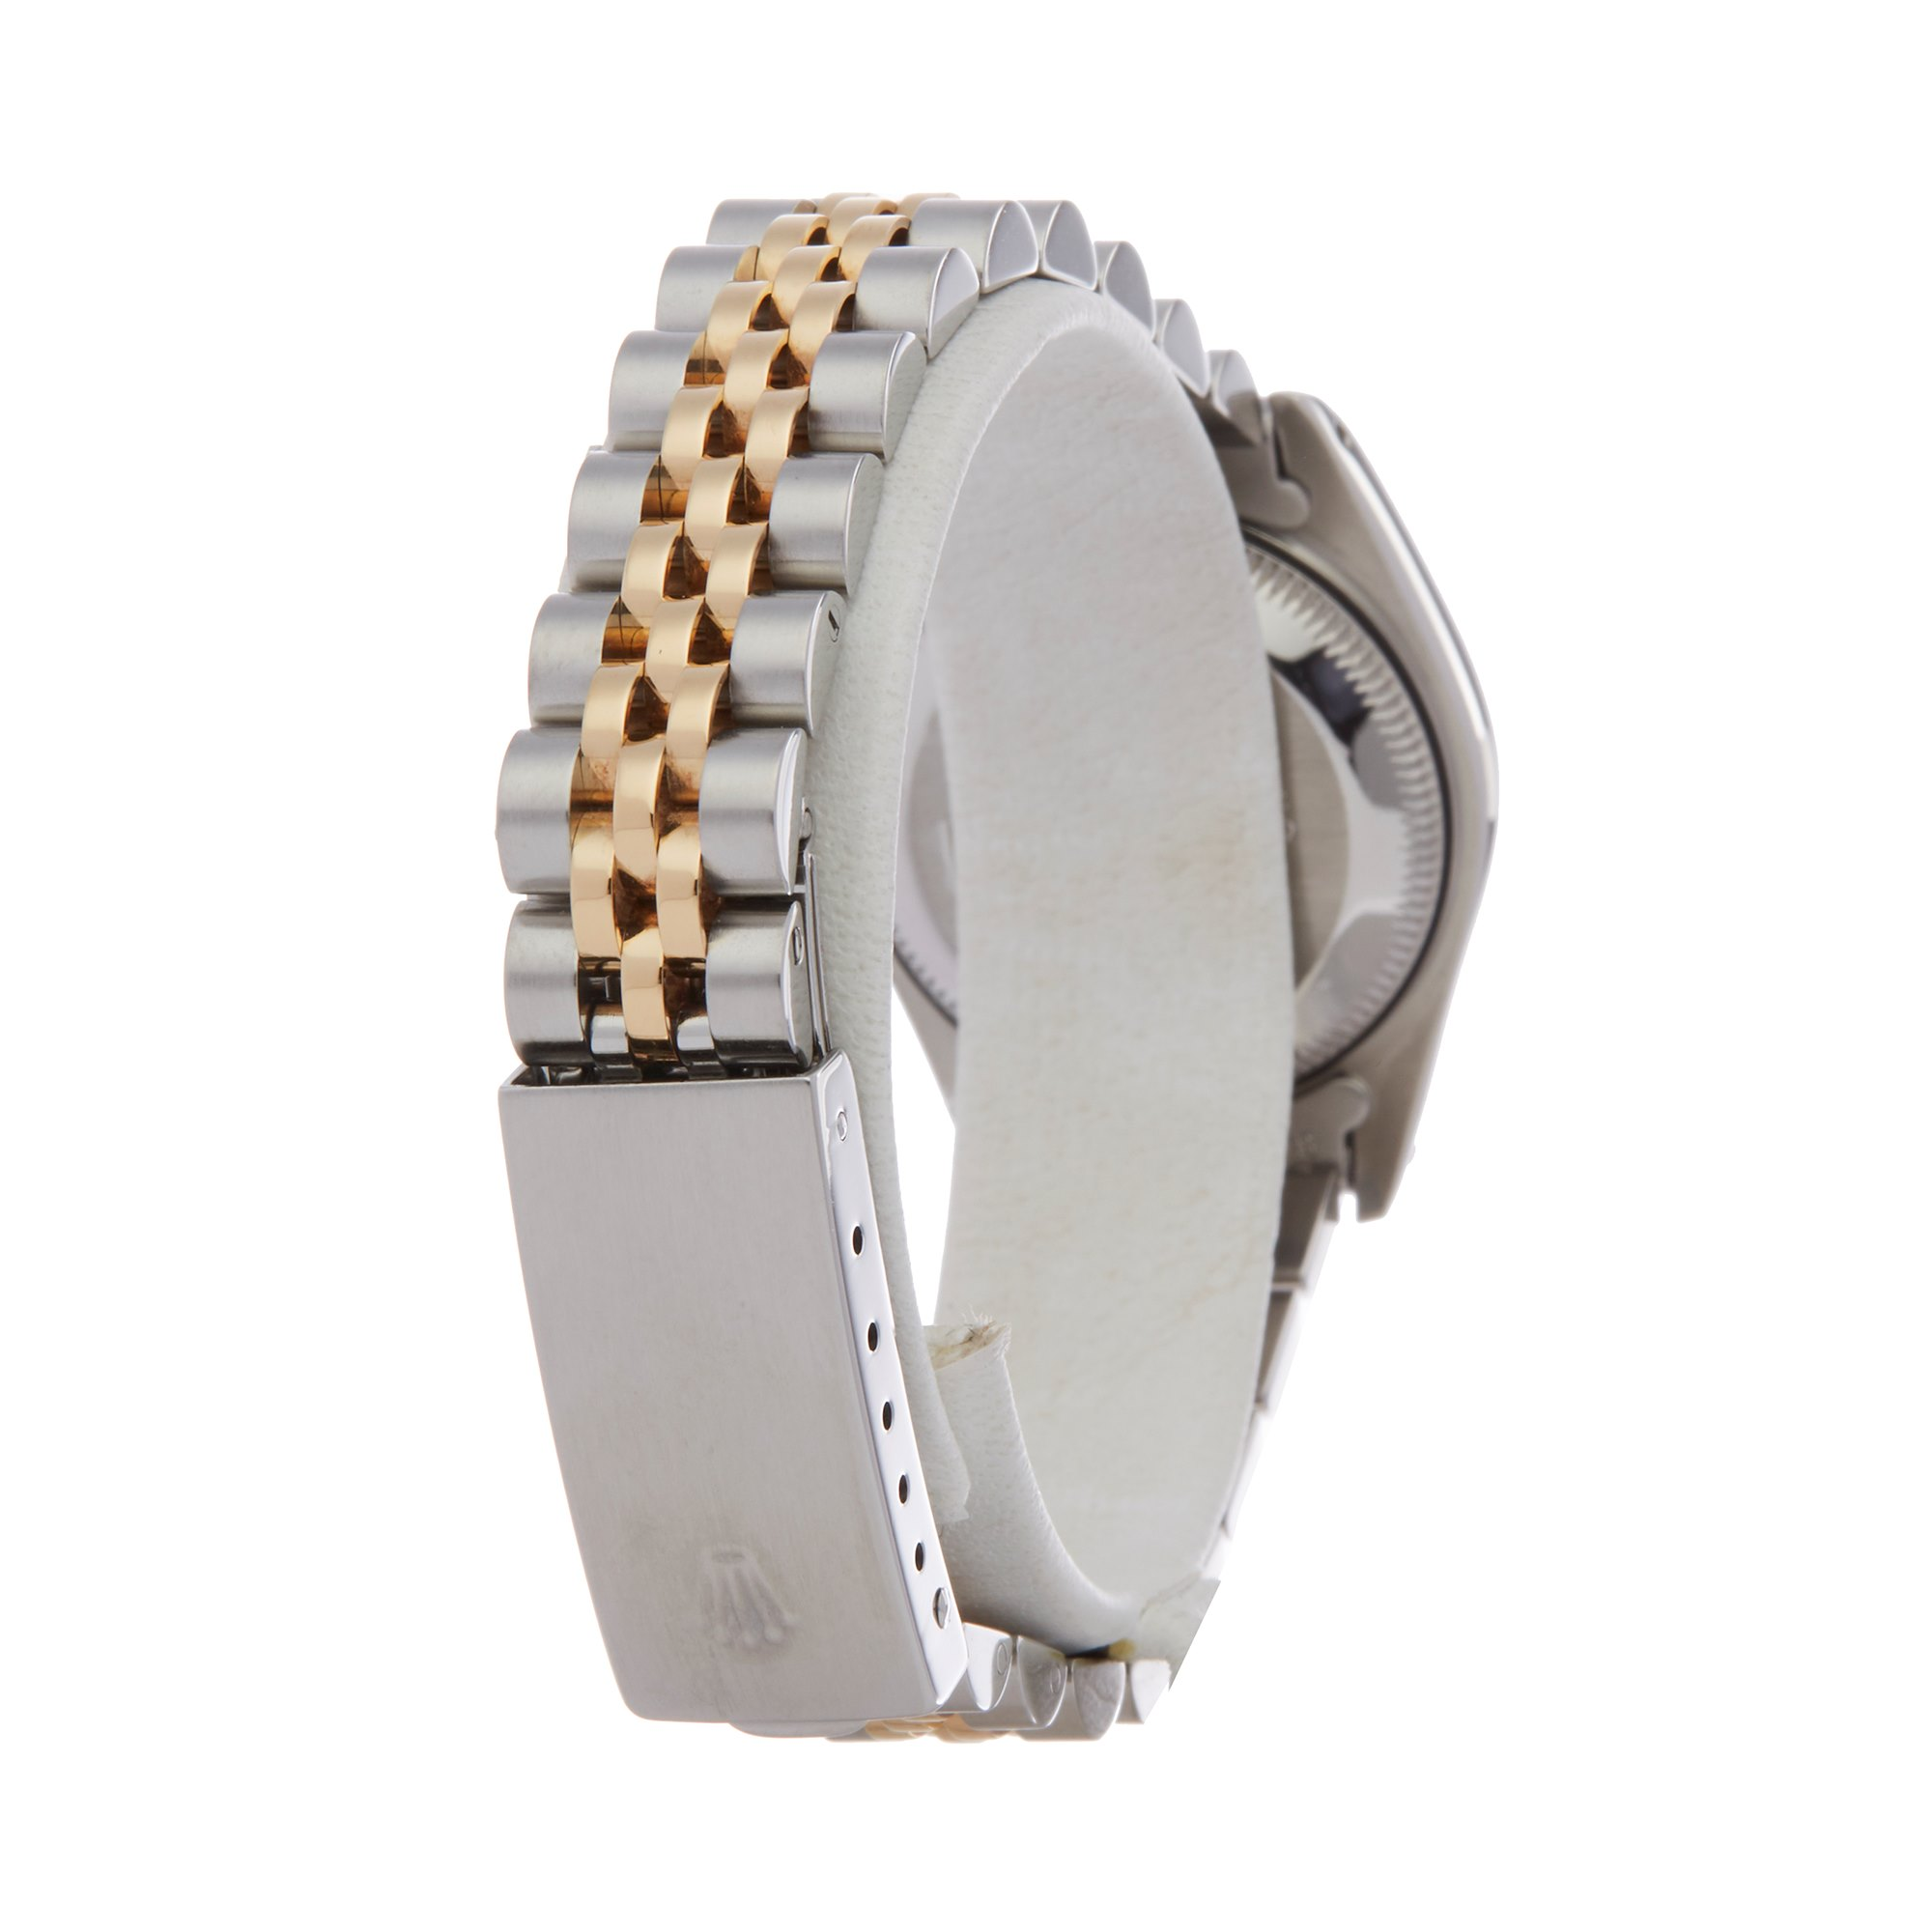 Rolex Datejust 26 Diamond 18K Stainless Steel & Yellow Gold 69173